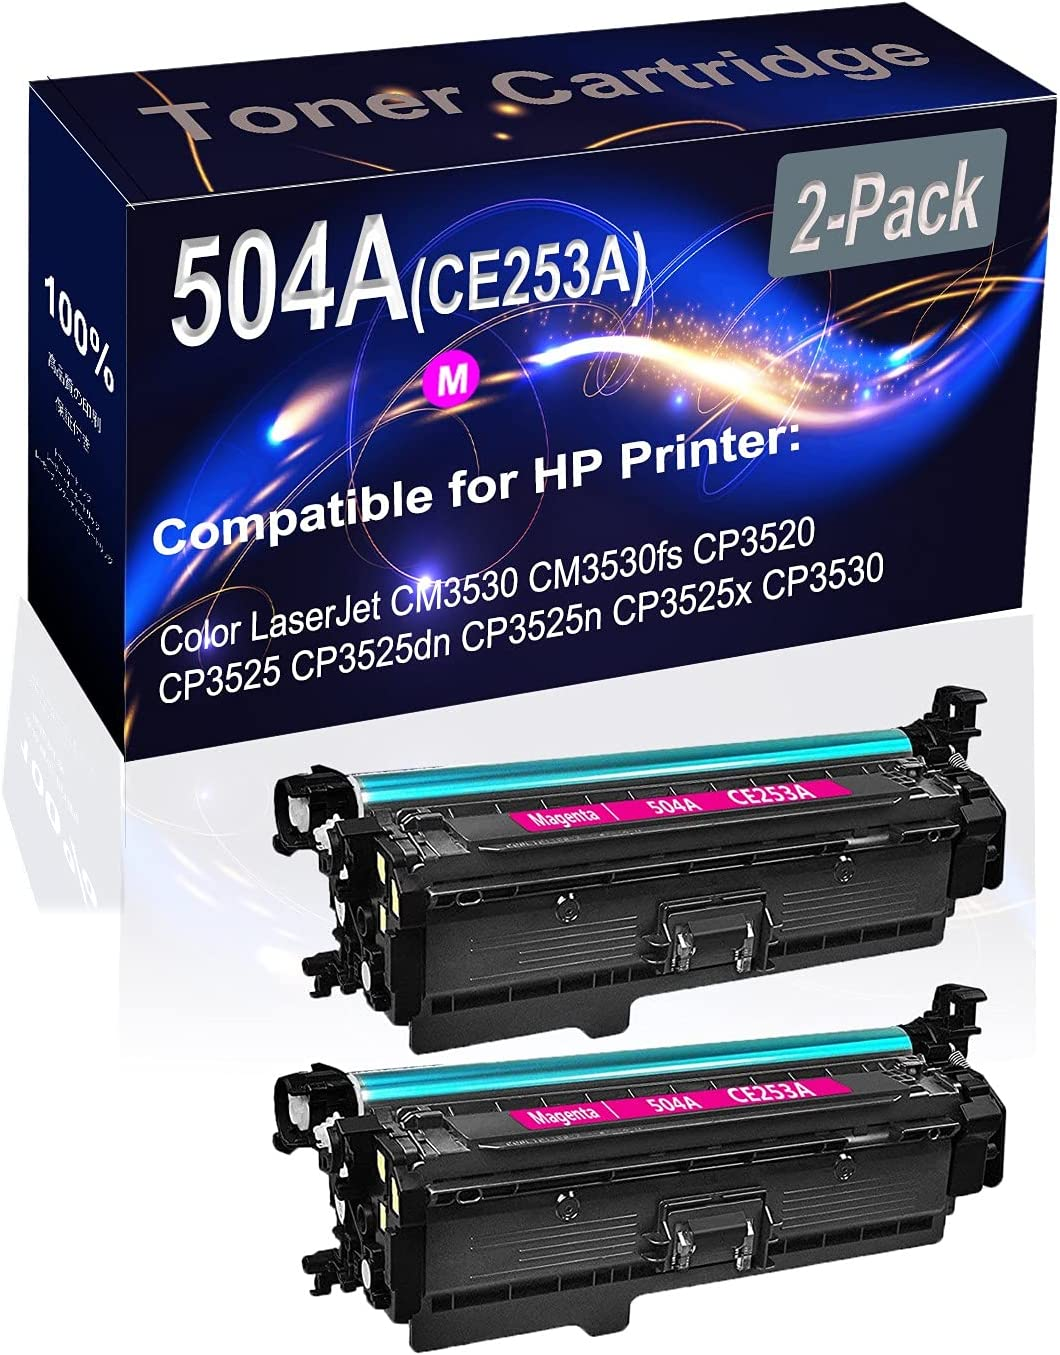 2-Pack (Magenta) Compatible CM3530 CM3530FS Laser Printer Toner Cartridge (High Capacity) Replacement for HP 504A (CE253A) Printer Toner Cartridge